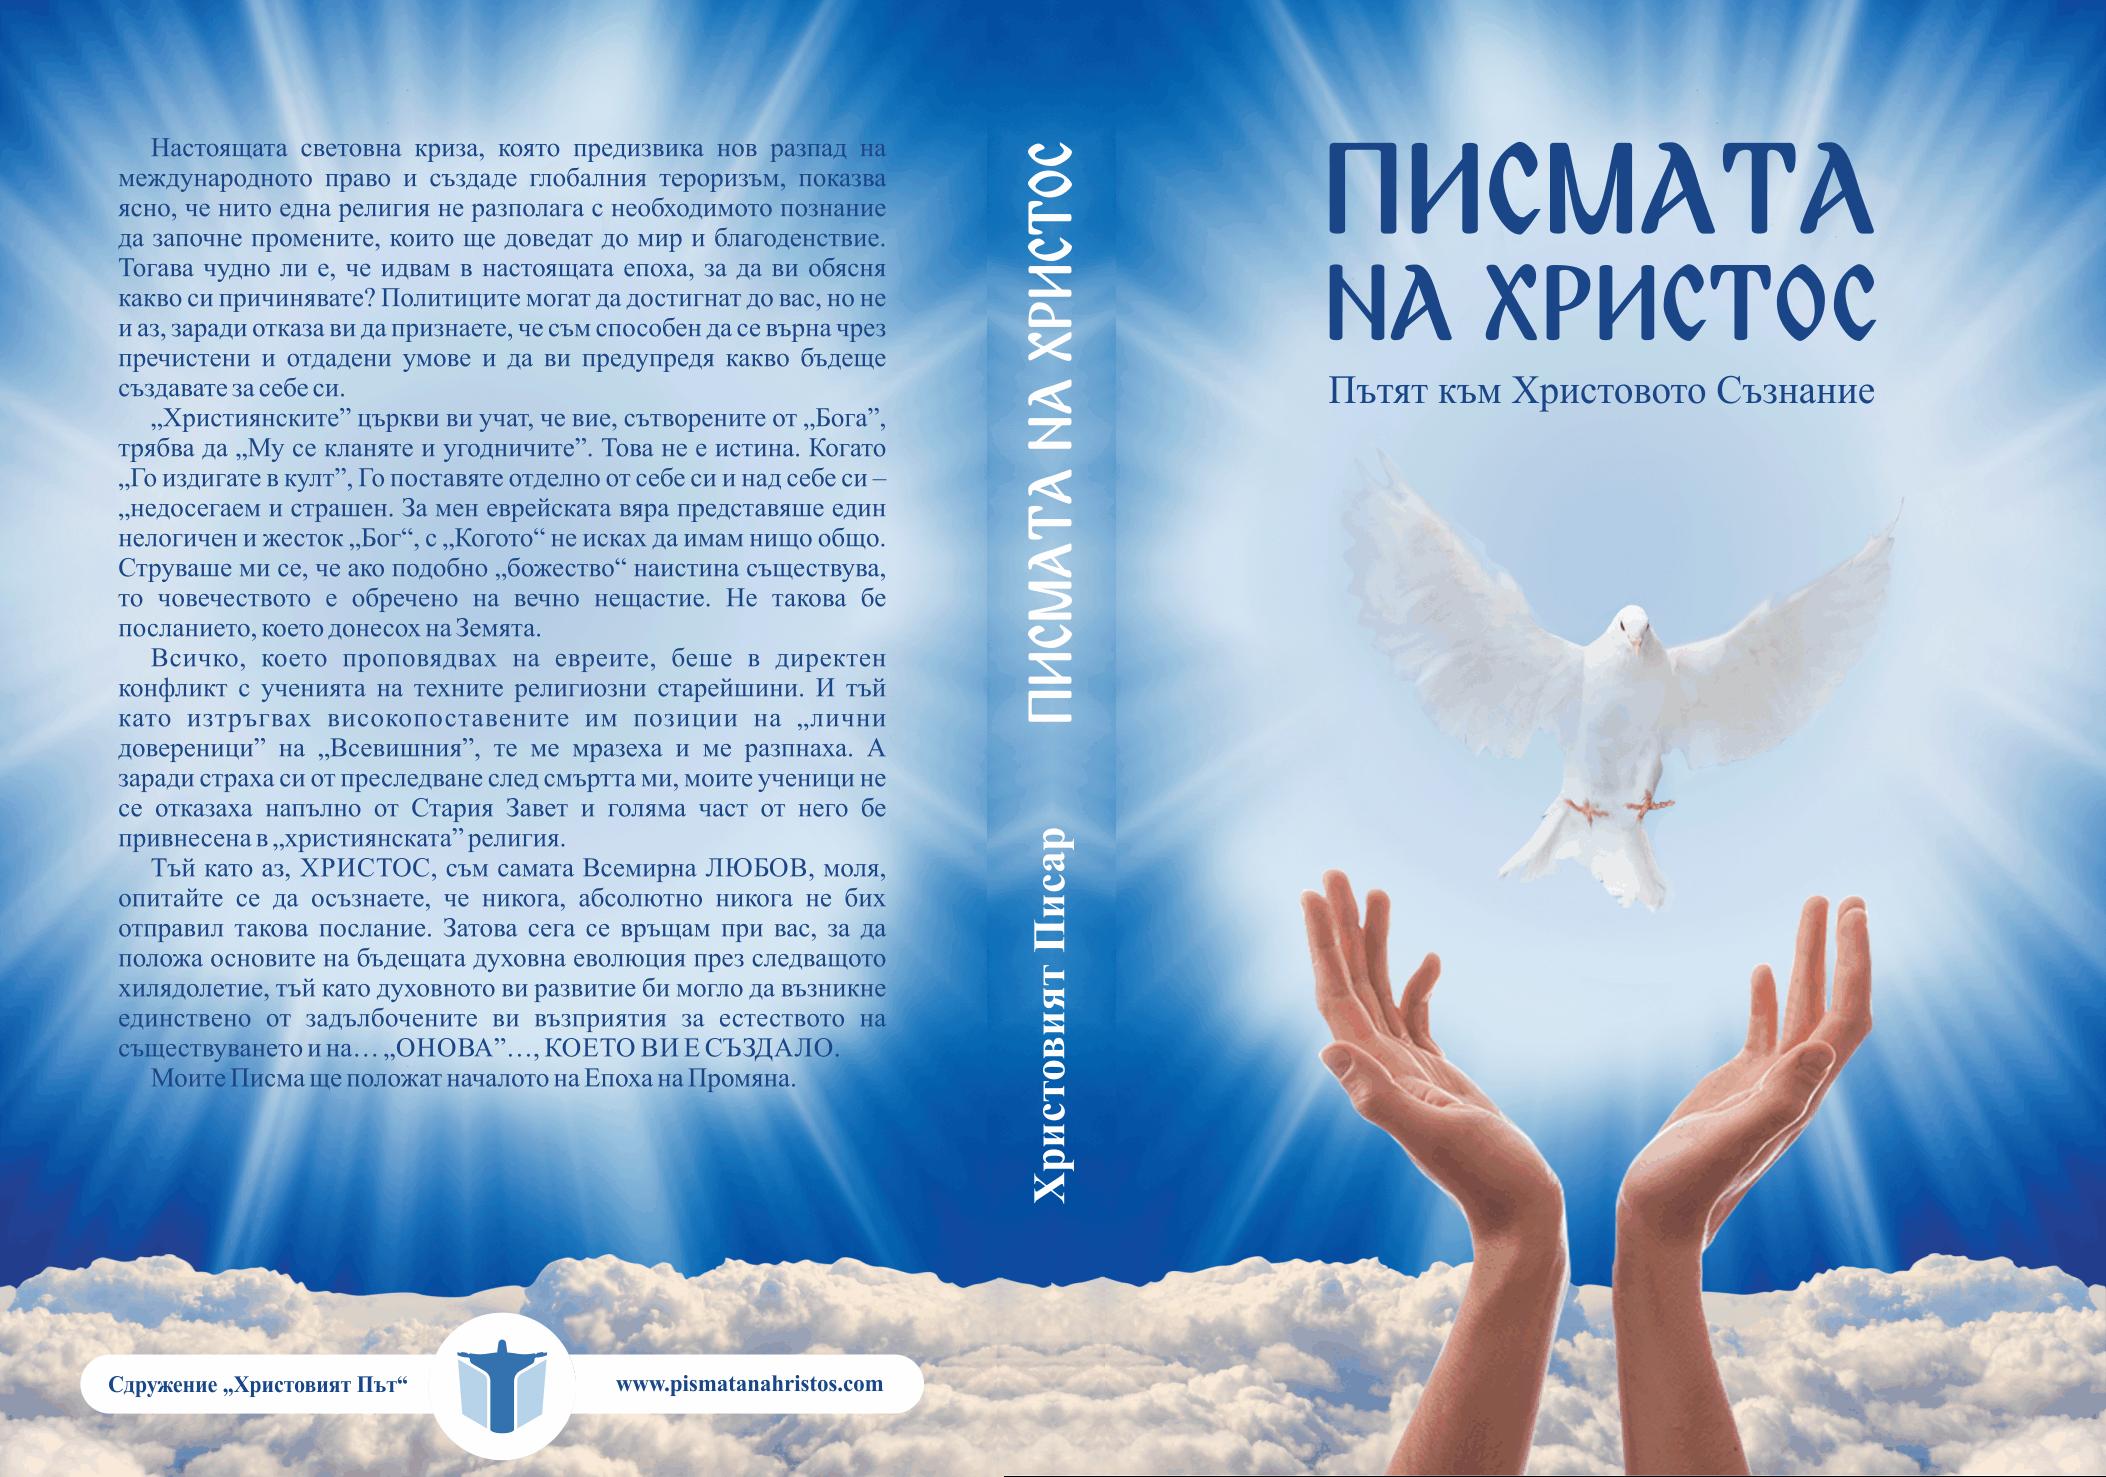 Поръчка на Писмата на Христос